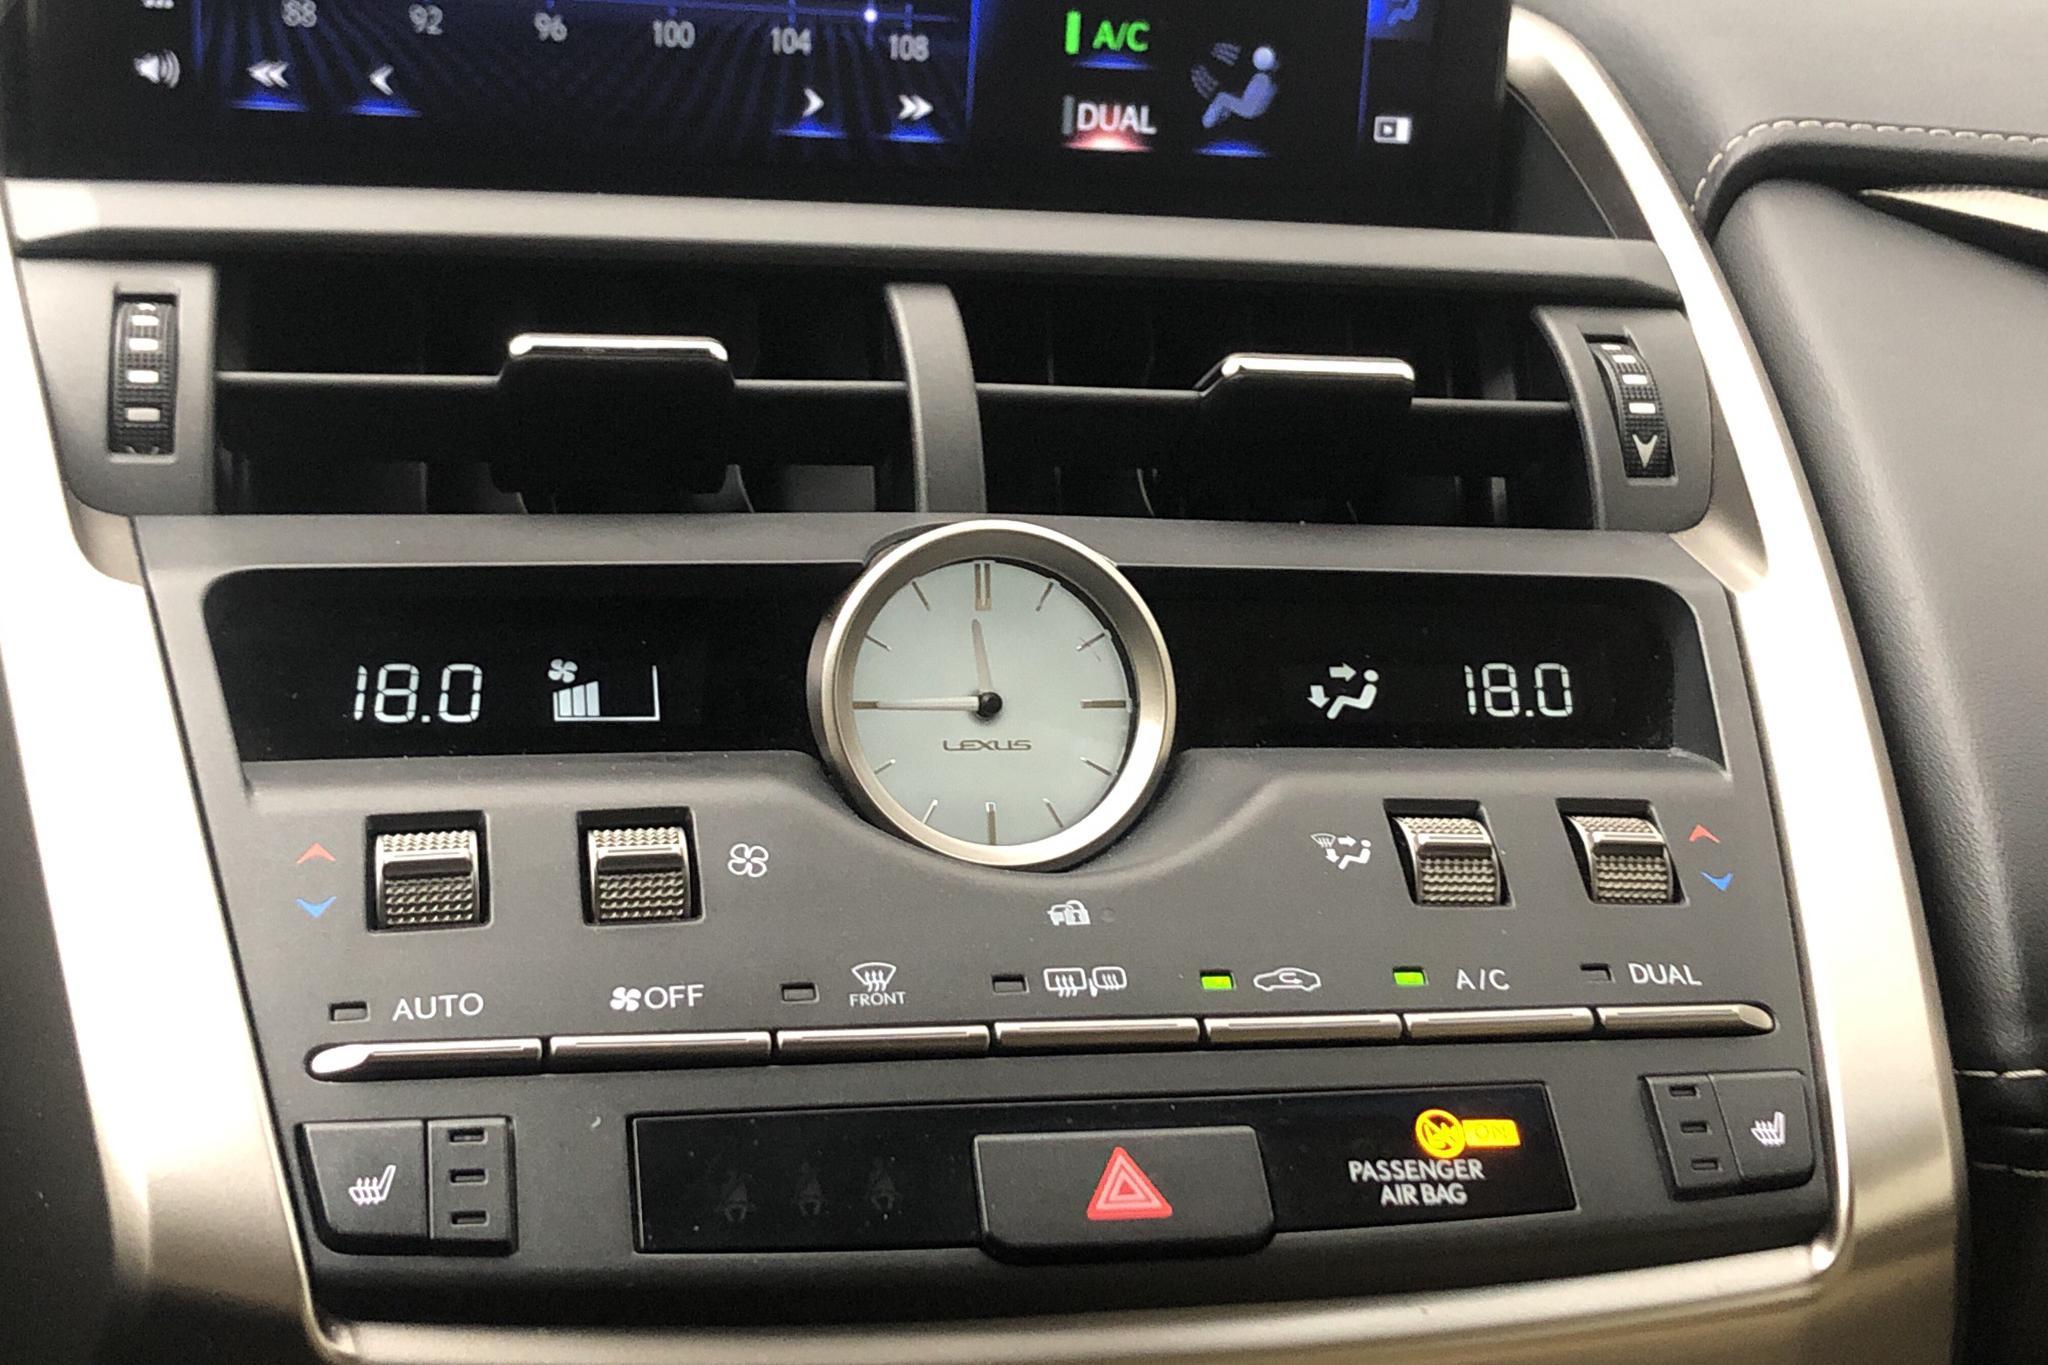 Lexus NX 300h AWD (181hk) - 39 040 km - Automatic - red - 2018